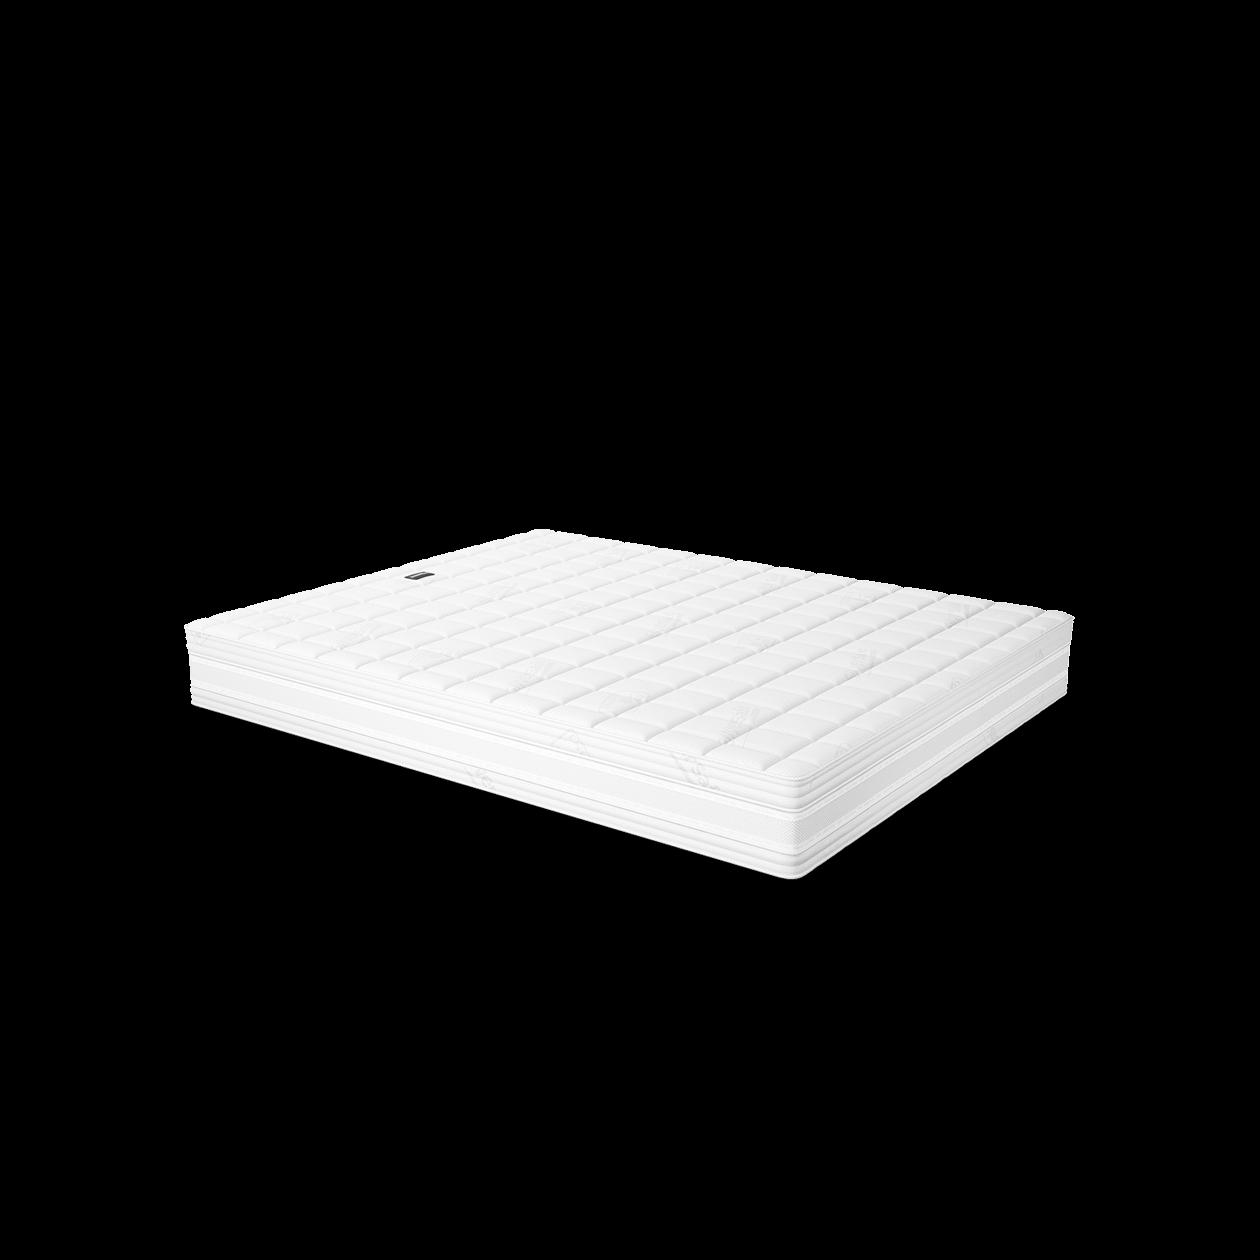 Silvercare матрак, от Magniflex